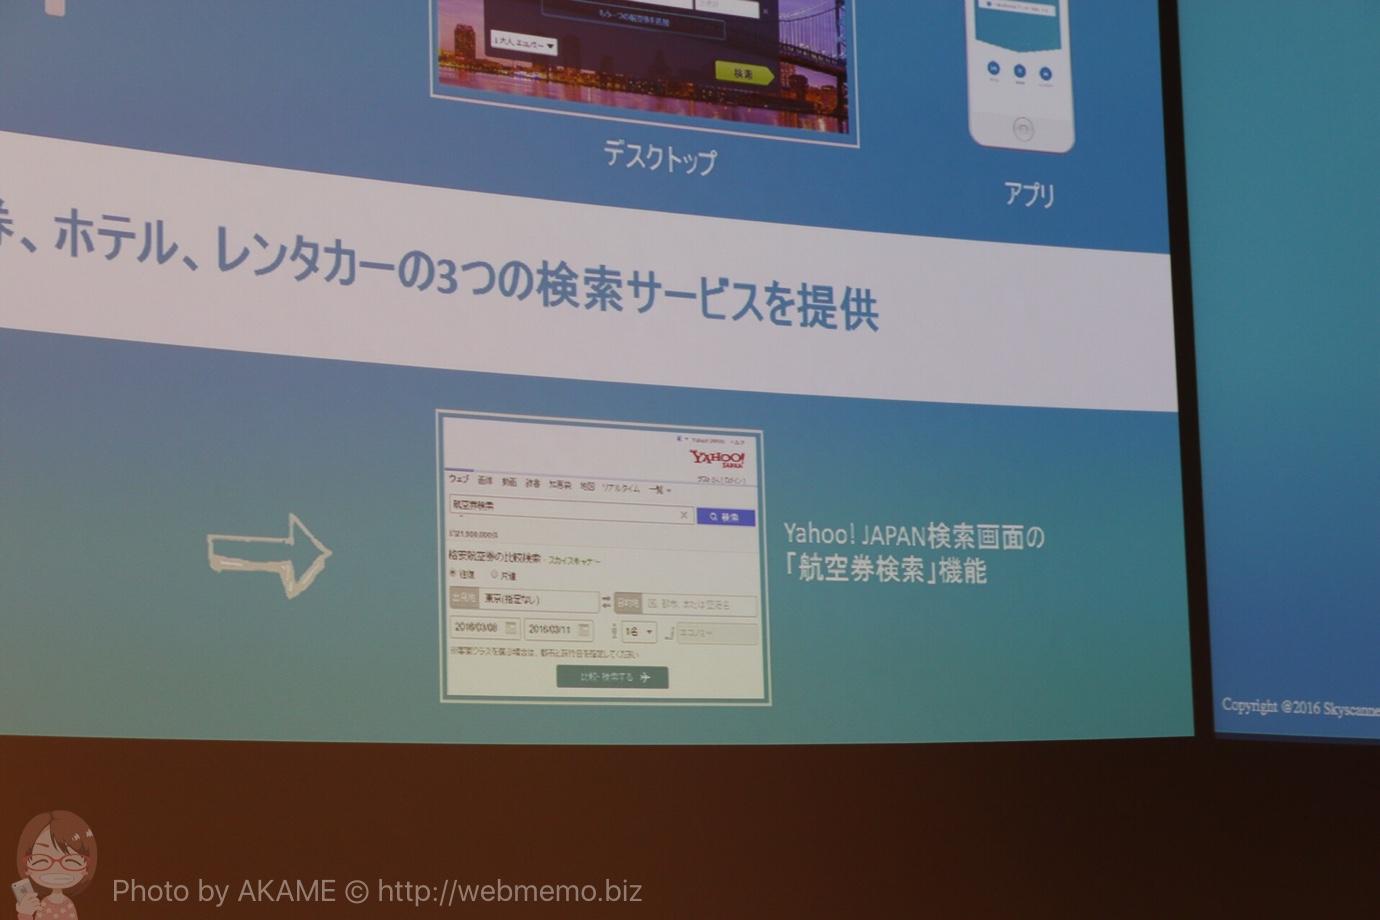 Yahoo!JAPAN検索画面の「航空券検索」機能